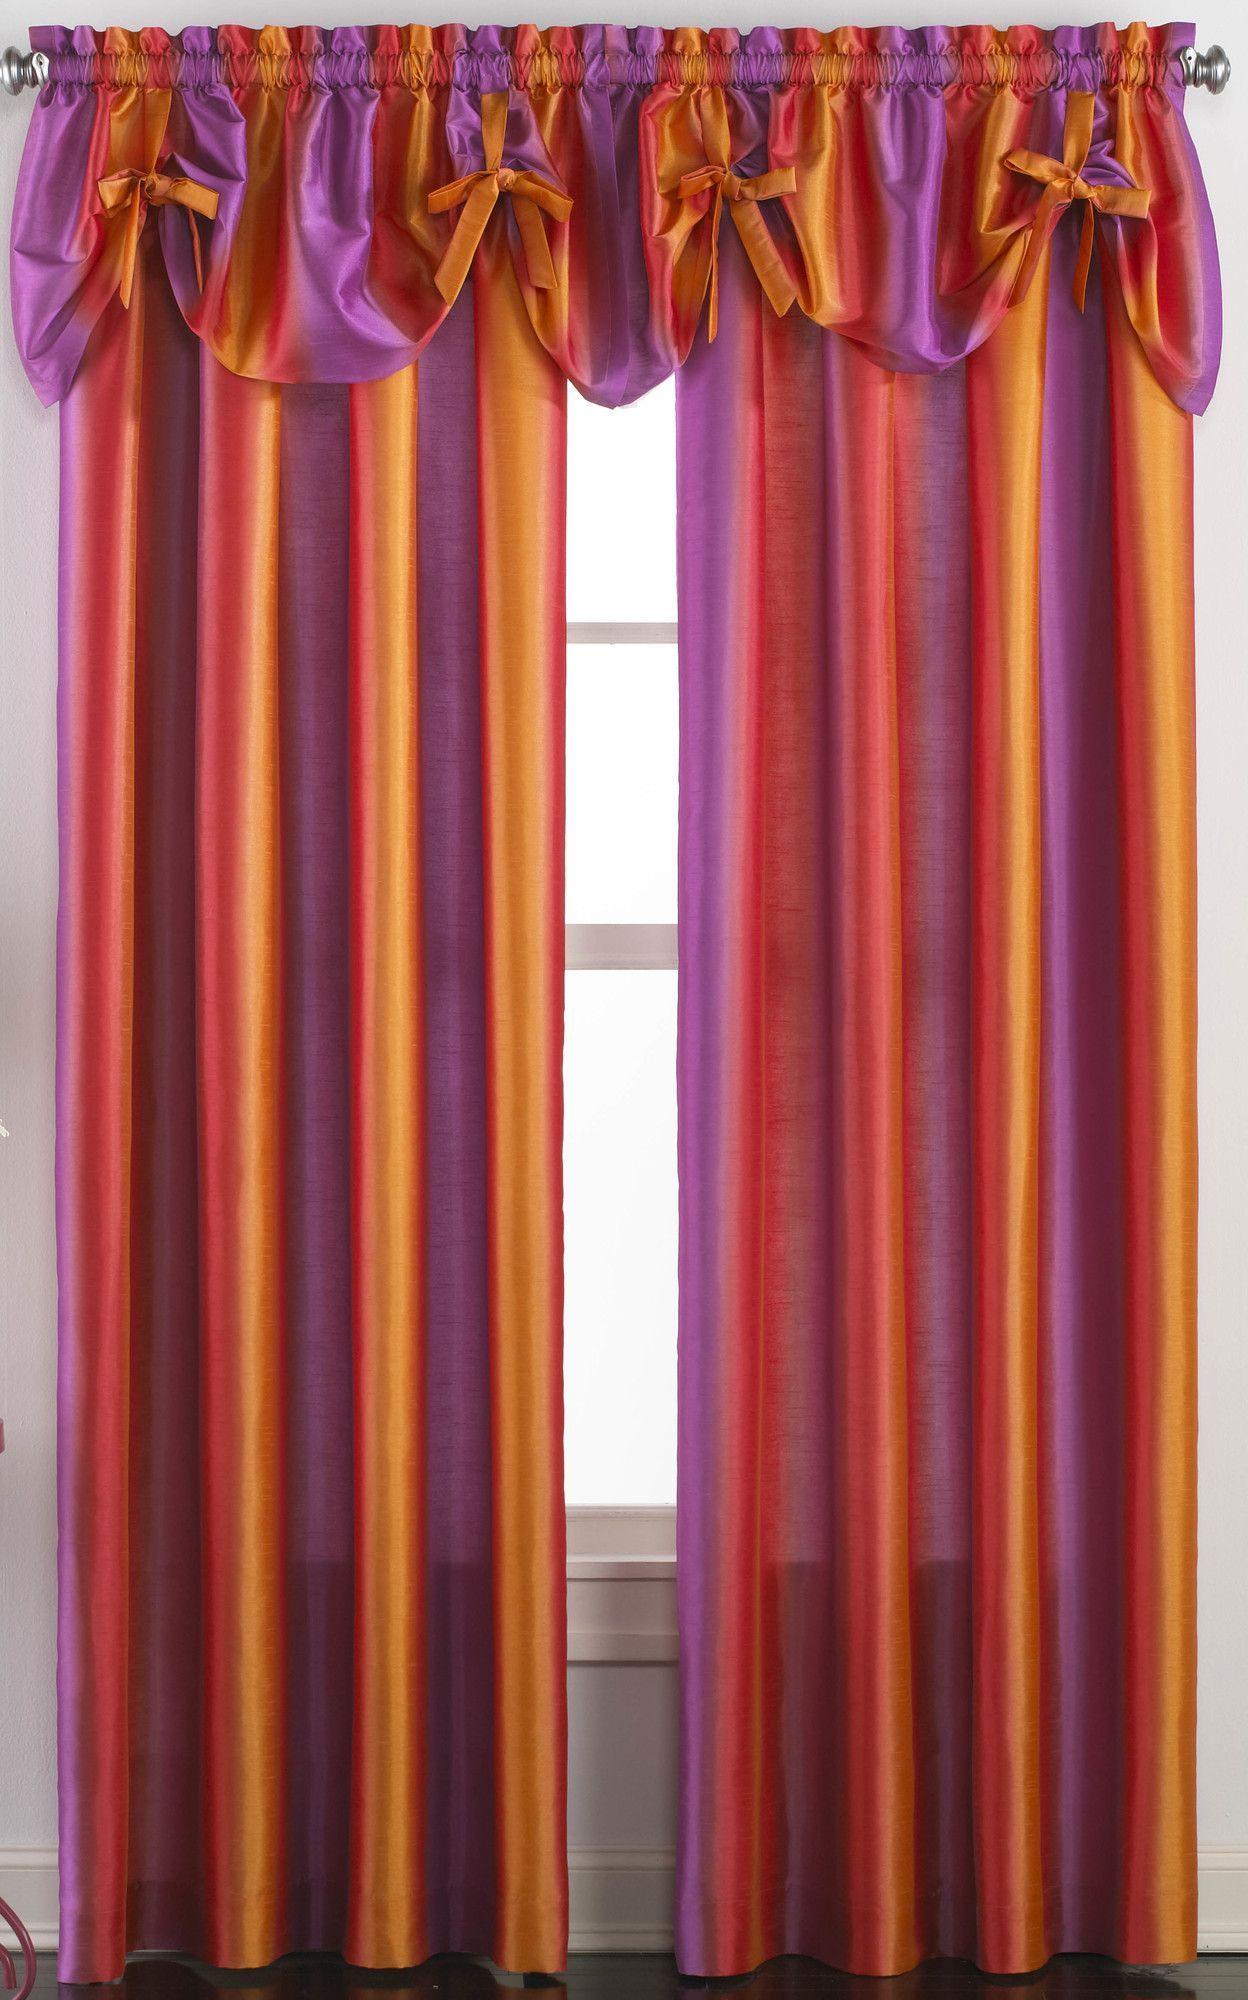 Rainbow Ombre Curtain Panel Faux Silk Curtains Girls Bedroom Curtains Ombre Curtains